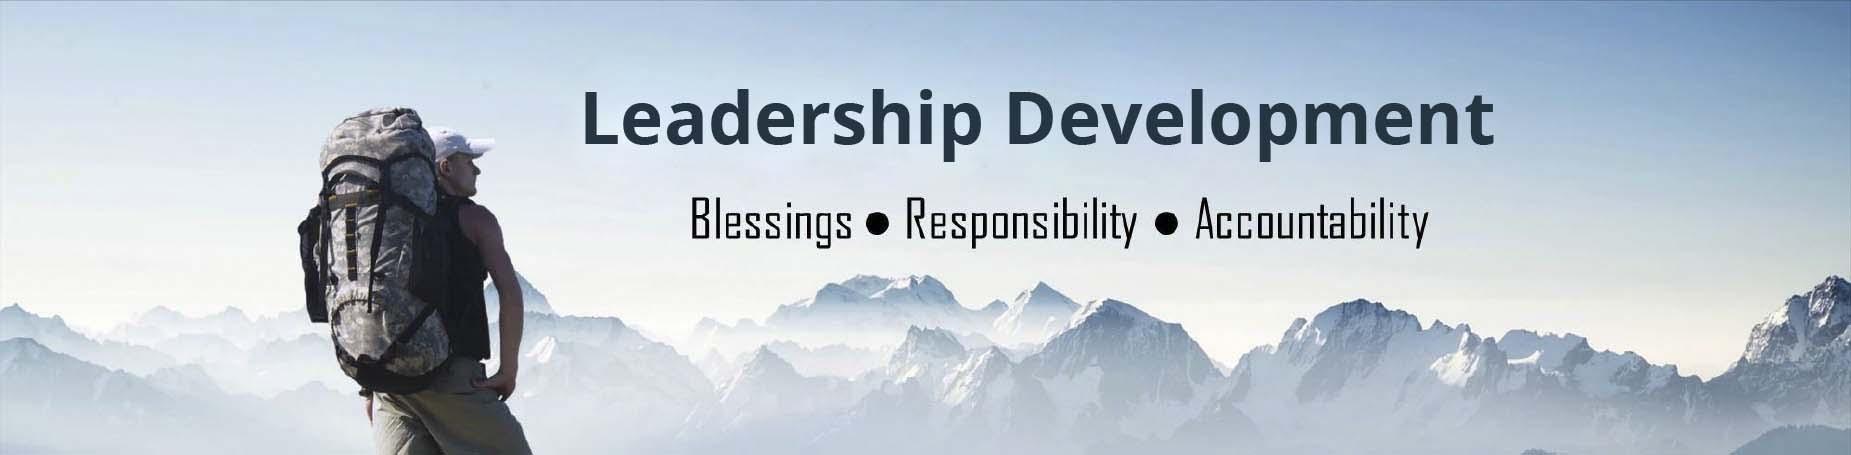 leadership_dev_banner_2